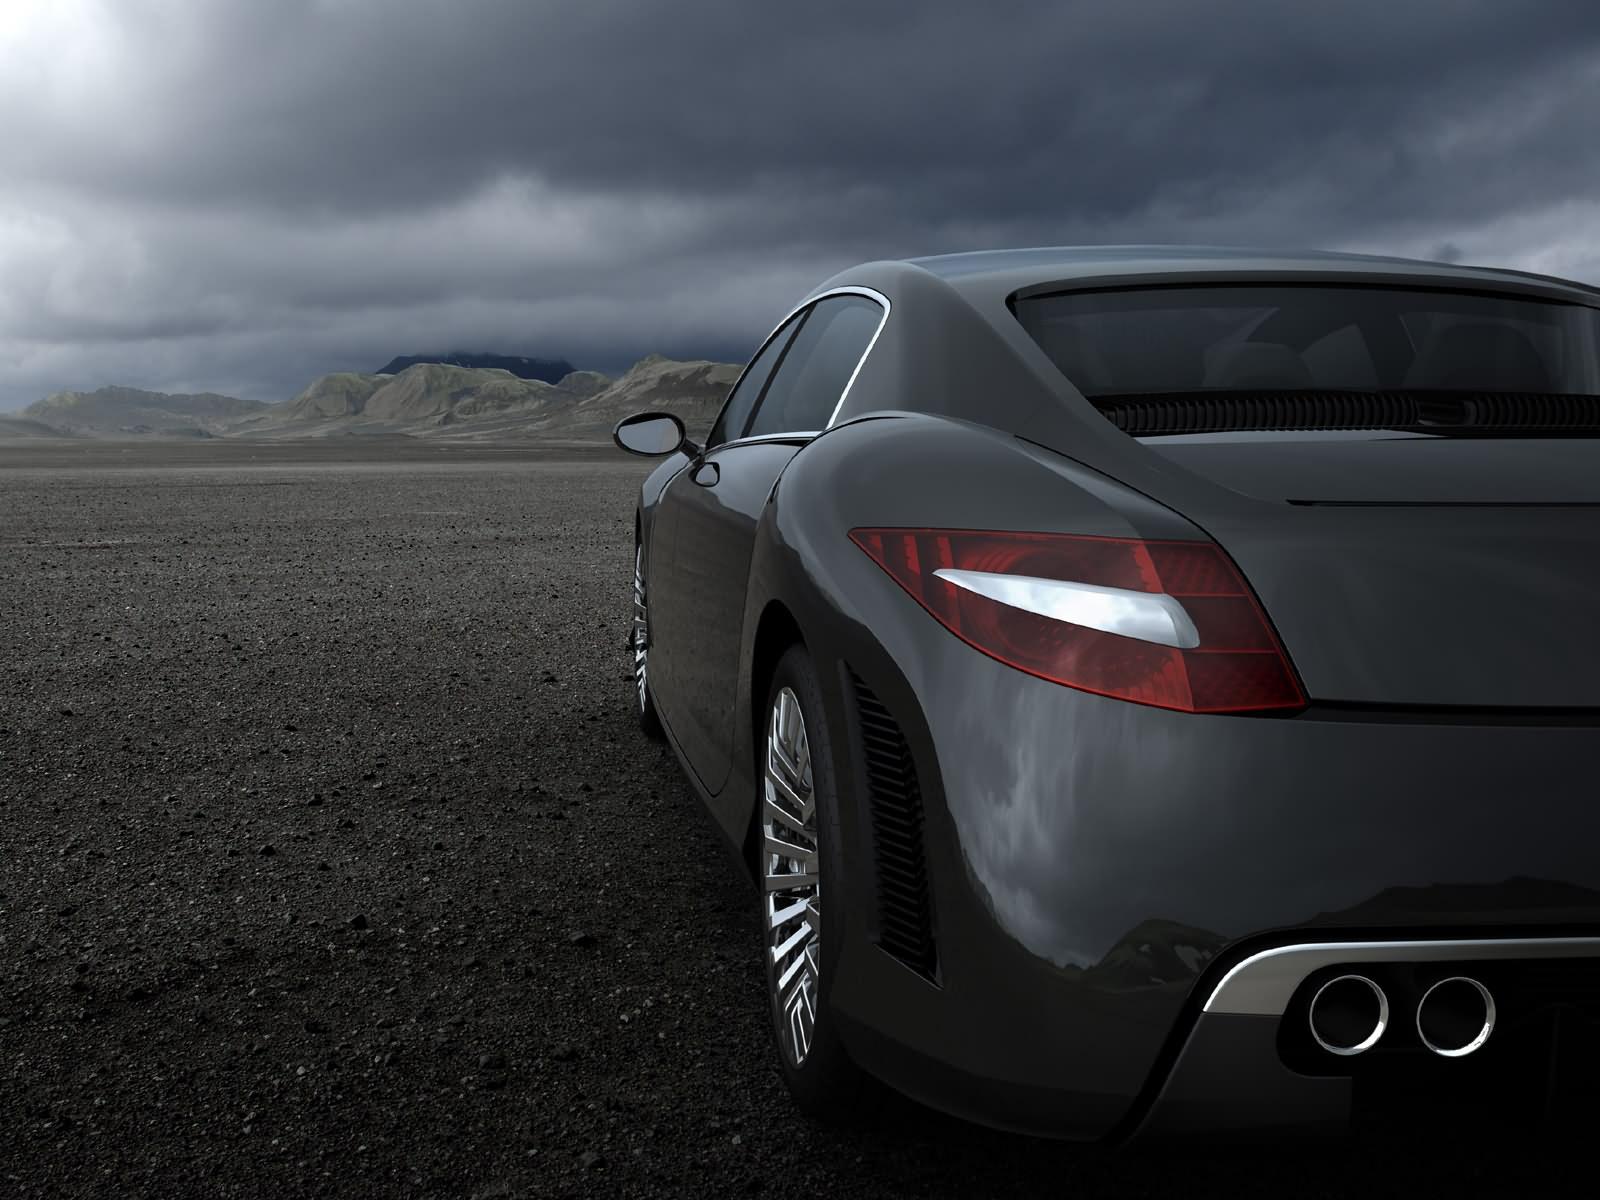 http://3.bp.blogspot.com/-UbloRCqrWng/TkNGo3BQ2LI/AAAAAAAABzU/d0OnC6FM4to/s1600/cars_0016.jpg